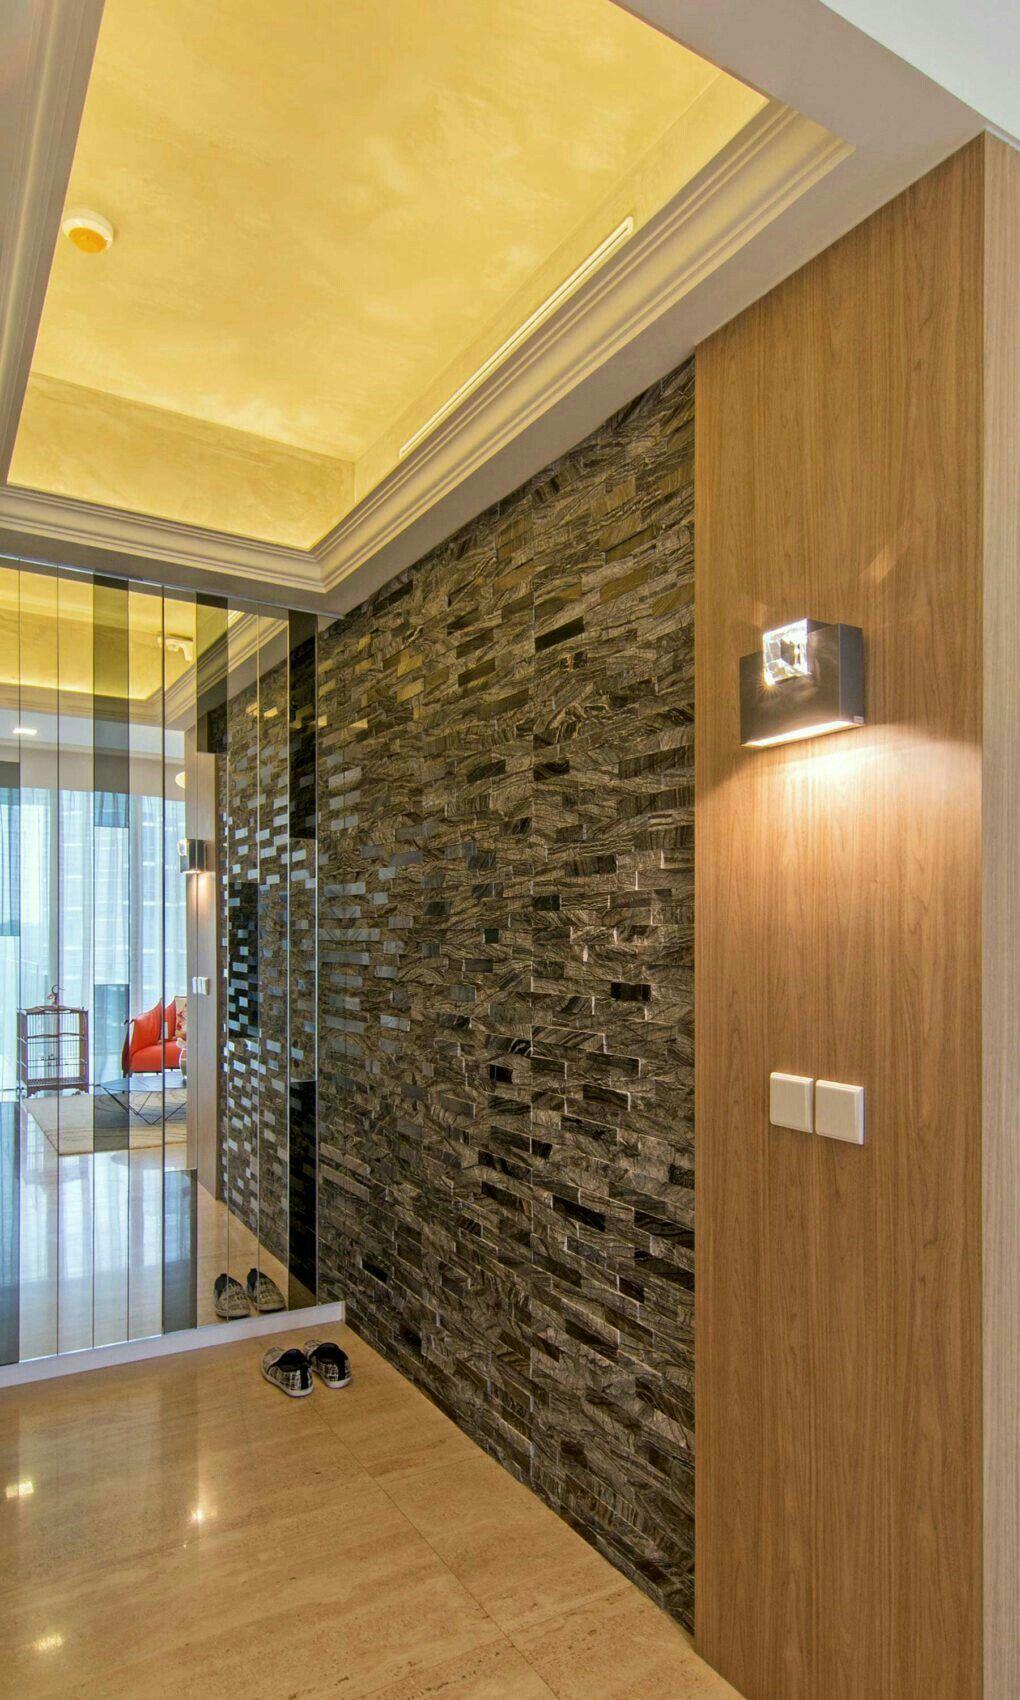 Pin by bharan vishal on WALL u FLOOR Pinterest Ceiling and Walls